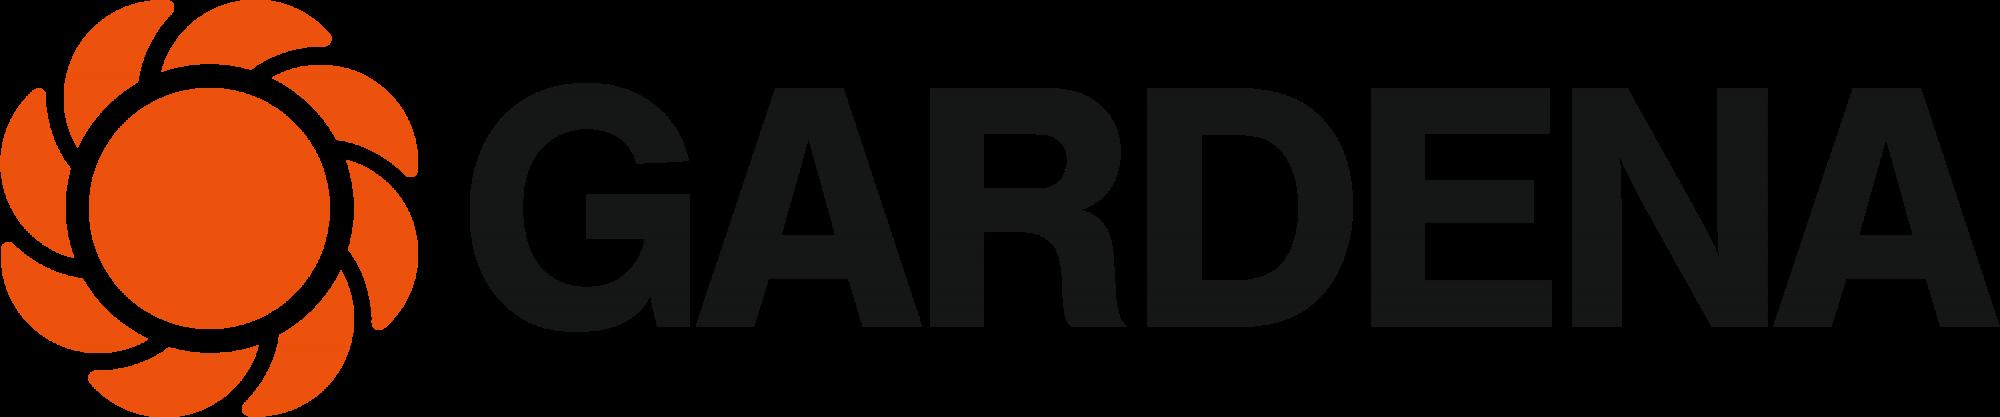 Gardena - Redskapsboden.se